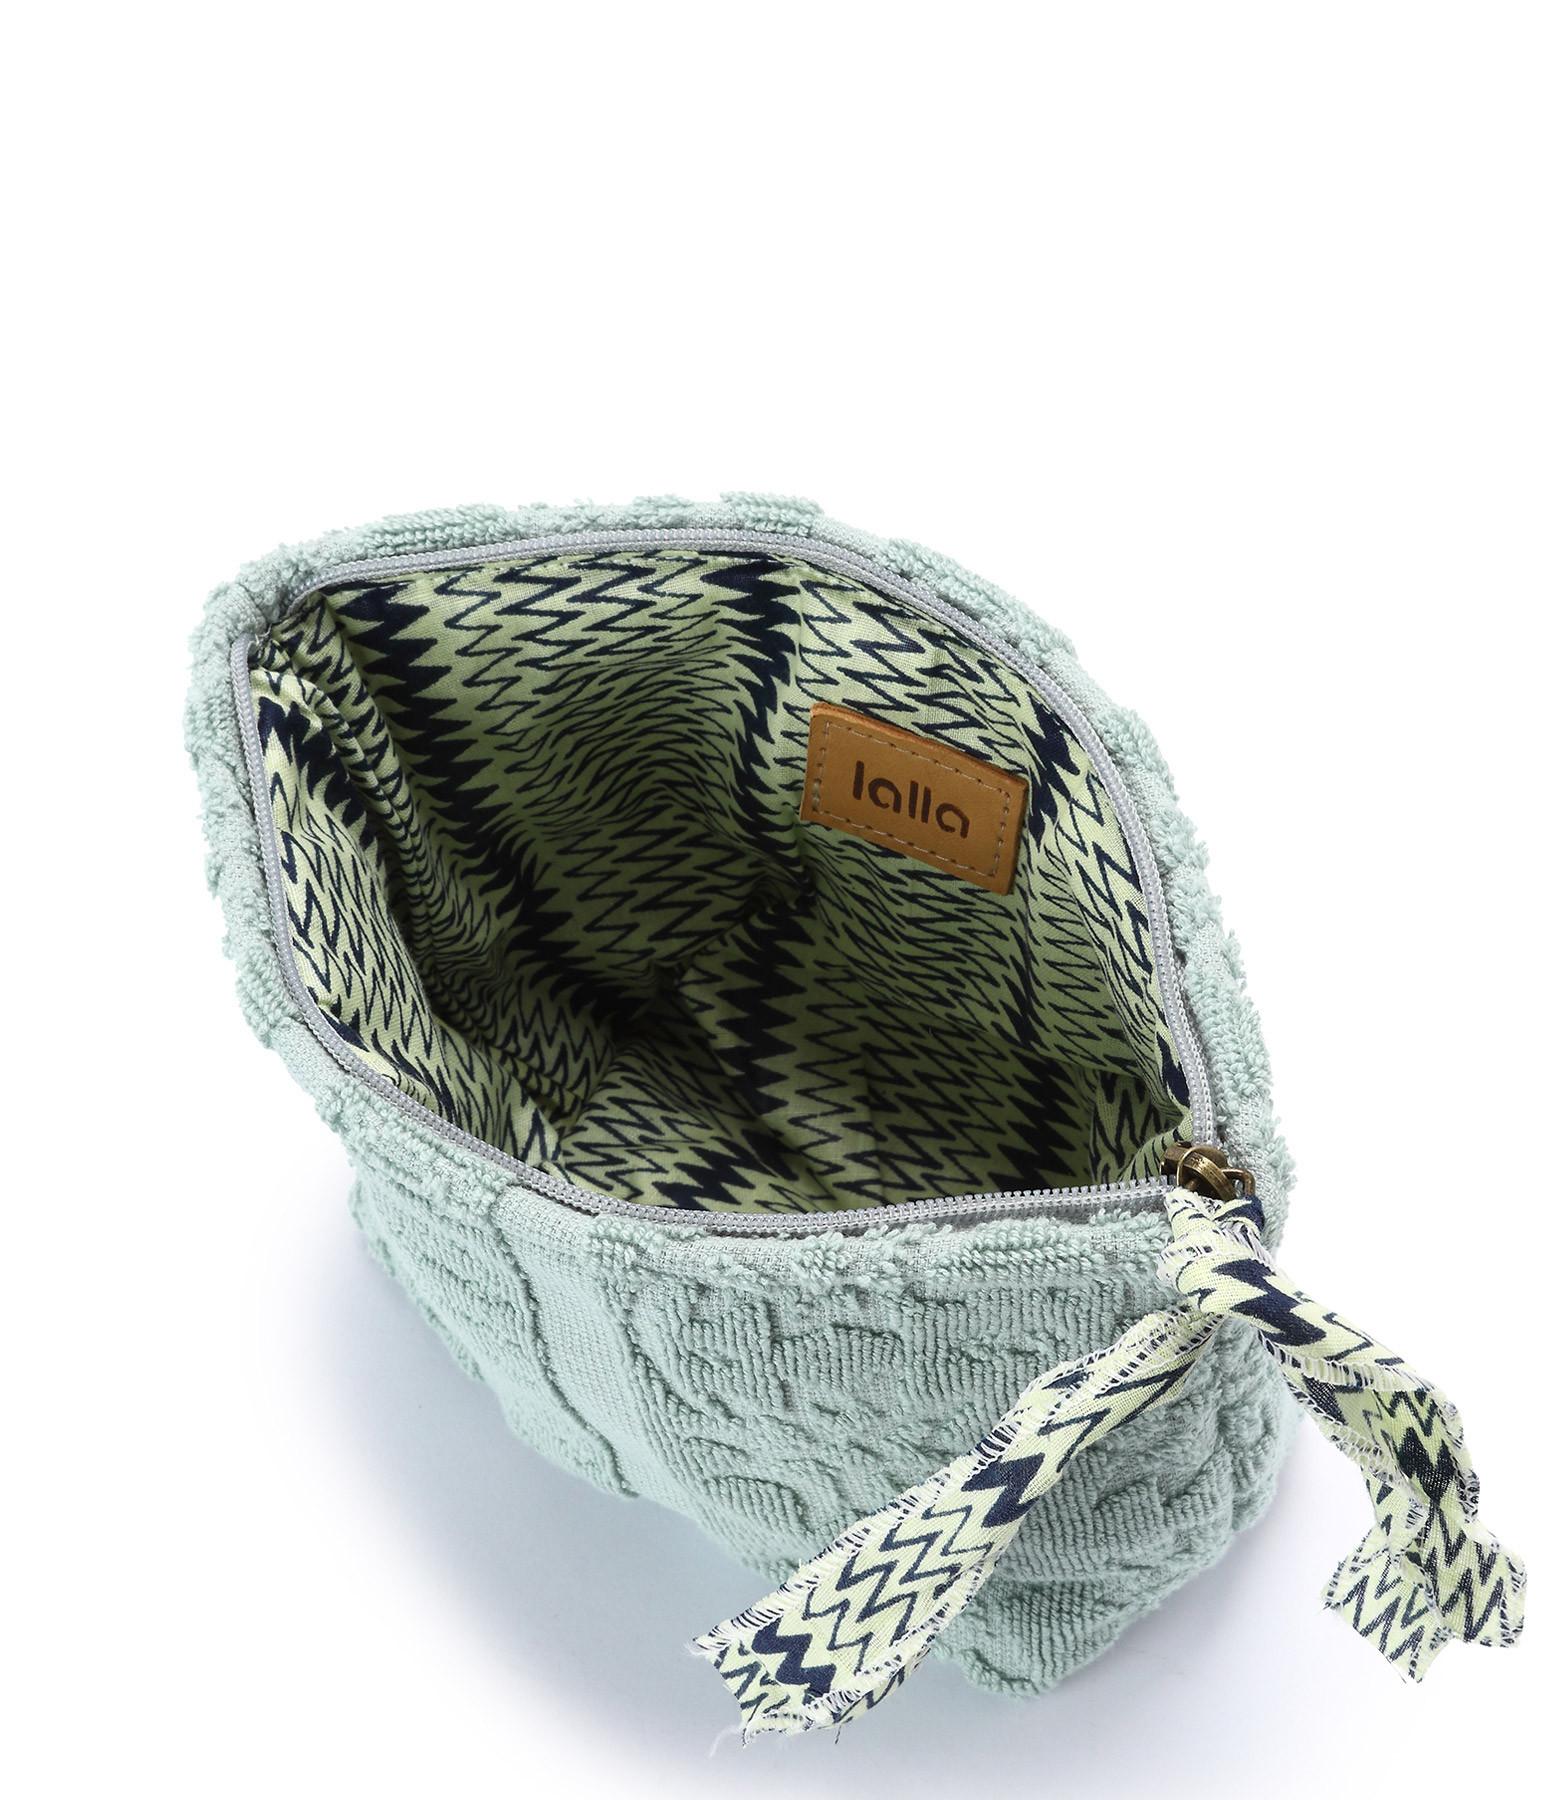 LALLA - Petite Trousse Walakin Eponge Bleu Gris